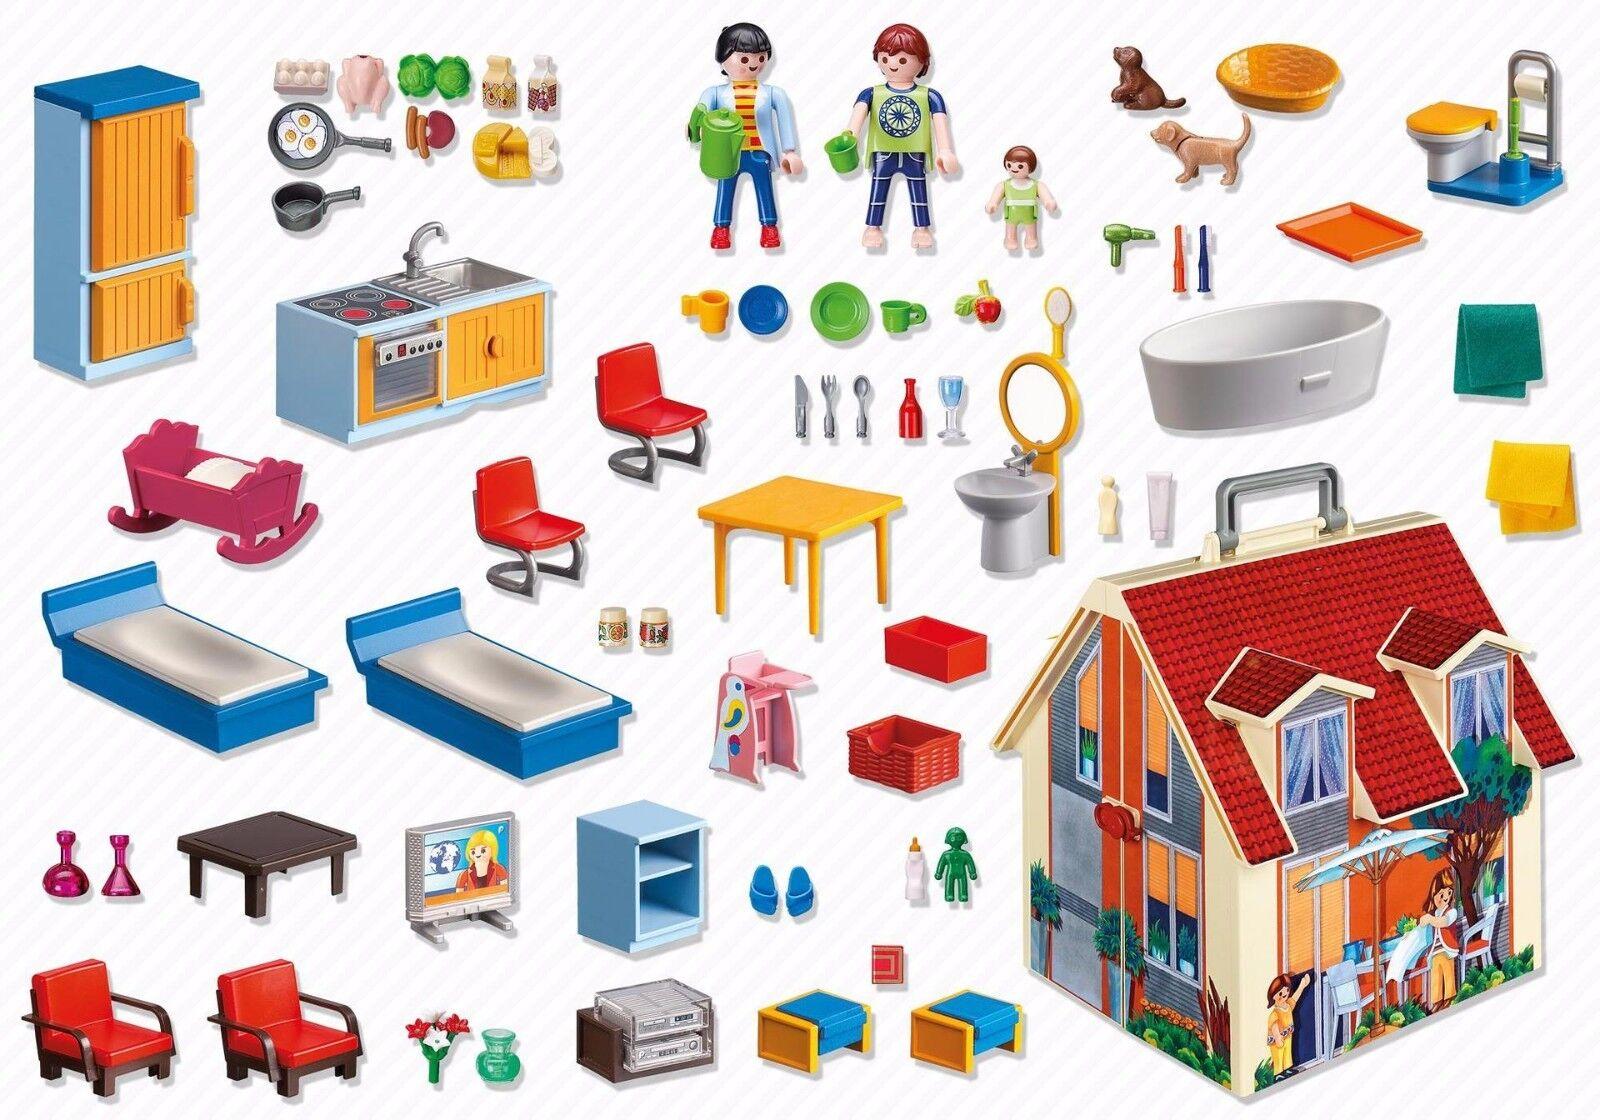 Playmobil 5167 Take Along Modern Doll House Casa de muñecas NEW BOXED Worldwide